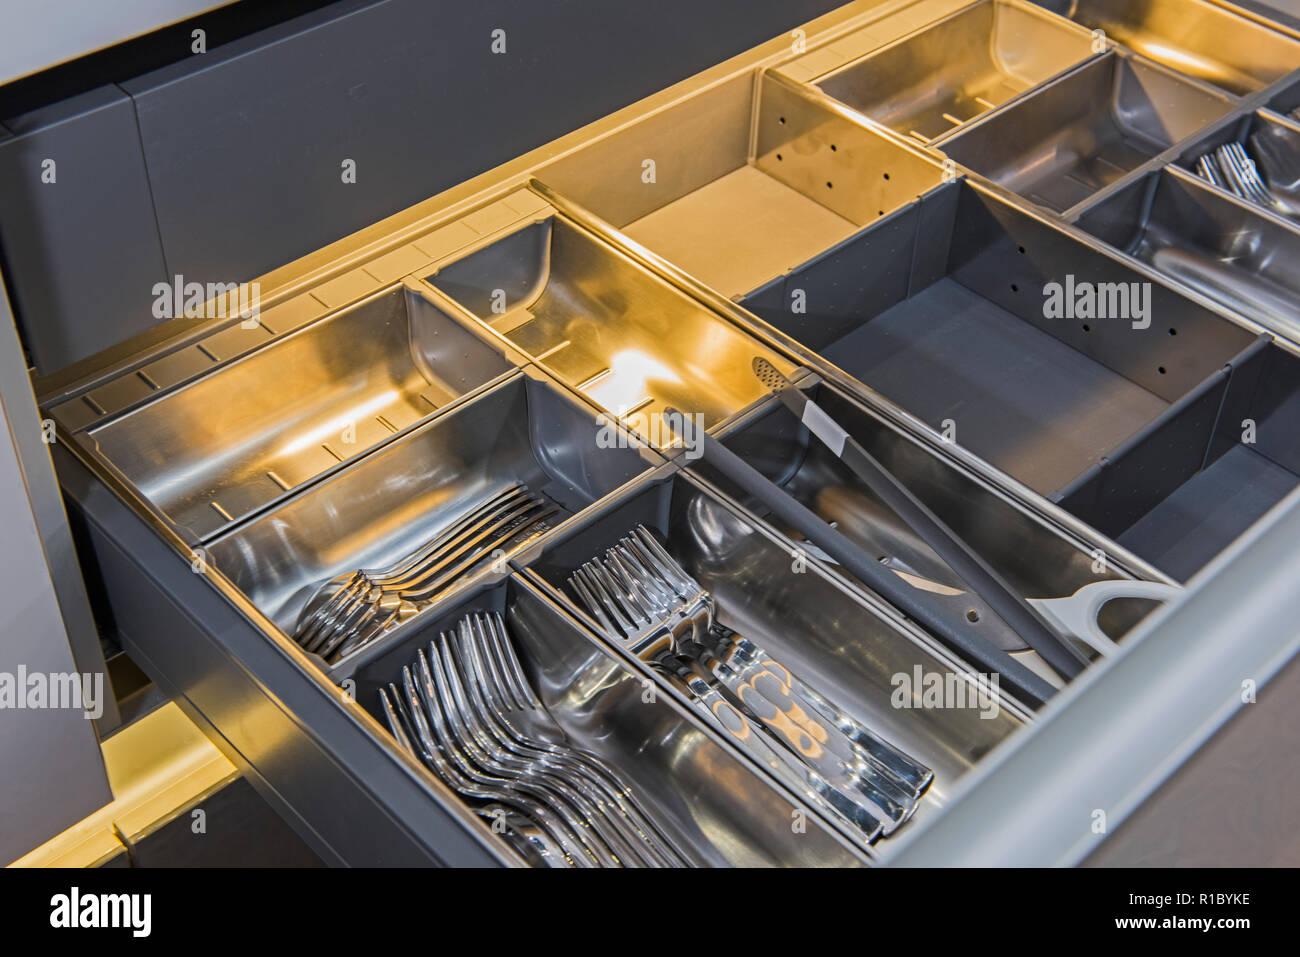 Interior Design Dekor Mit Besteck Schublade In Luxus Apartment Showroom Stockfotografie Alamy